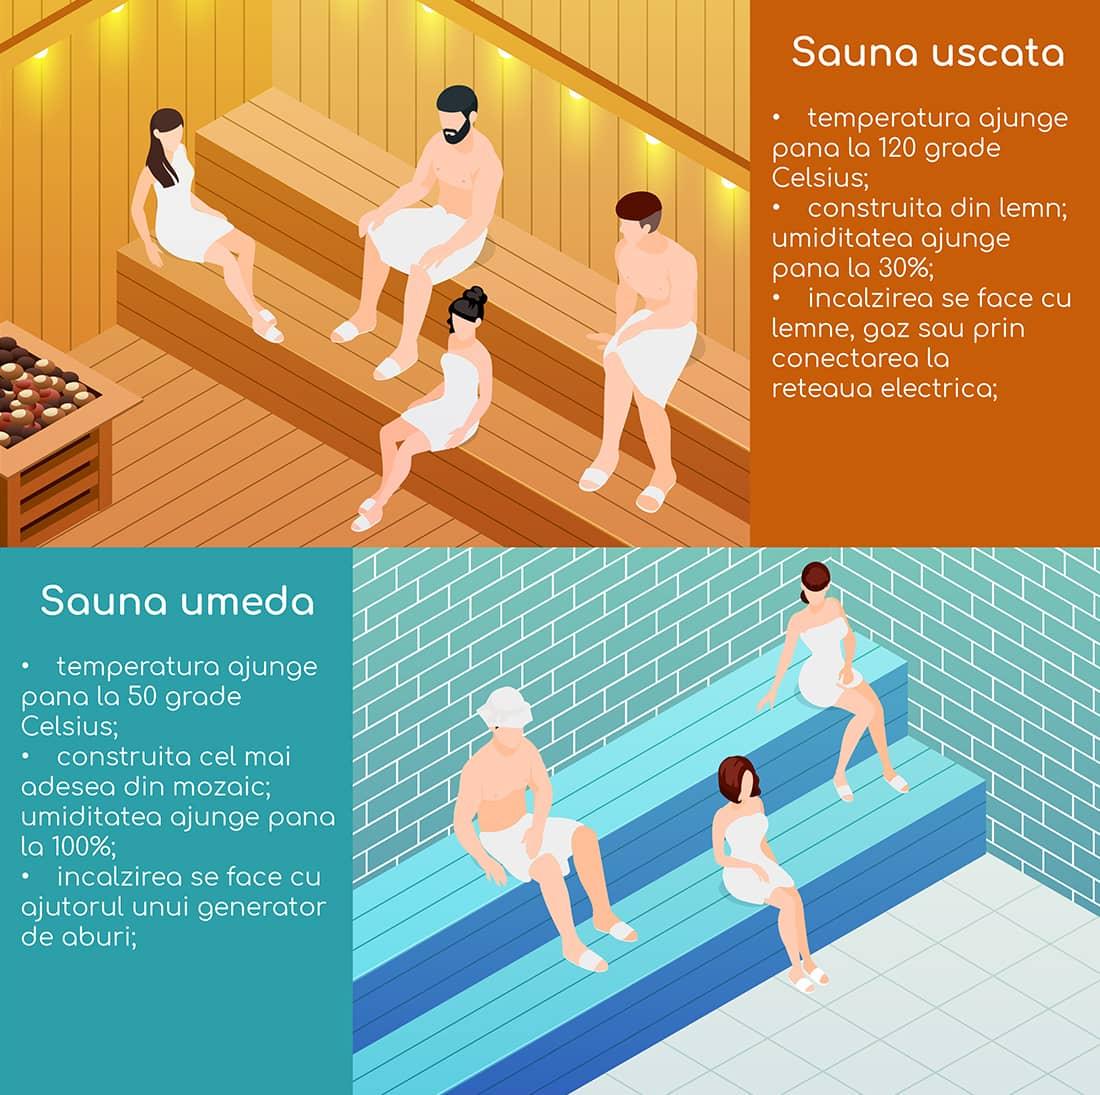 diferente intre sauna umeda si cea uscata